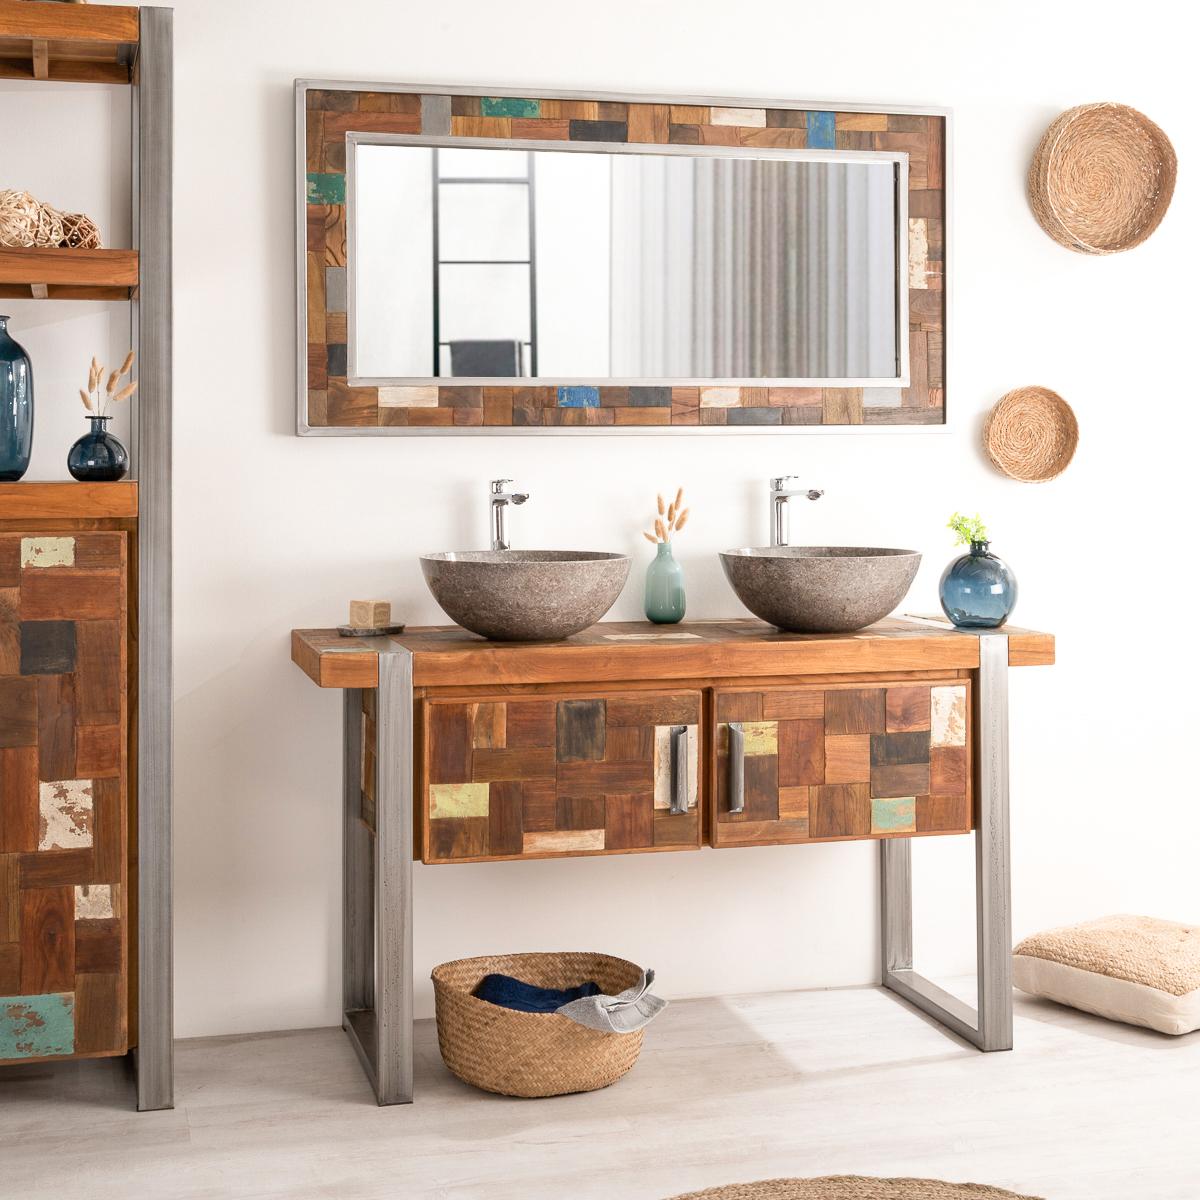 Meuble sous vasque double vasque en bois teck massif - Meuble d angle salle de bain ikea ...